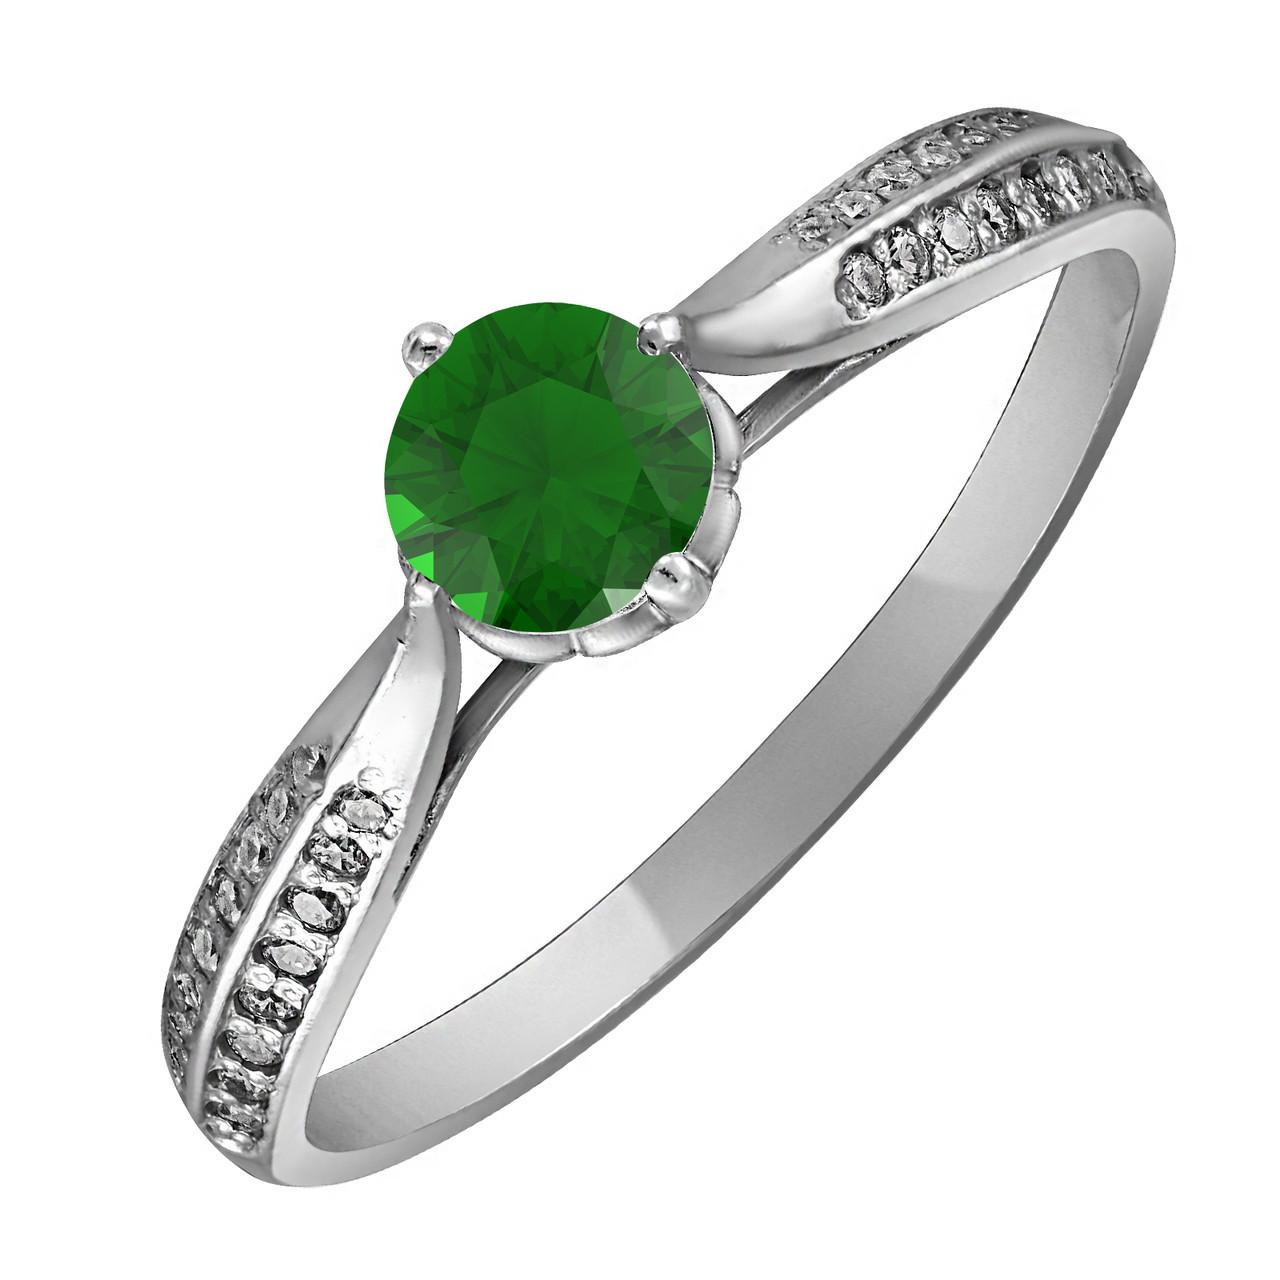 Кольцо из серебра с зелёным кубическим цирконием Twiddle Jewelry 16.5 размер (К007з-16.5)